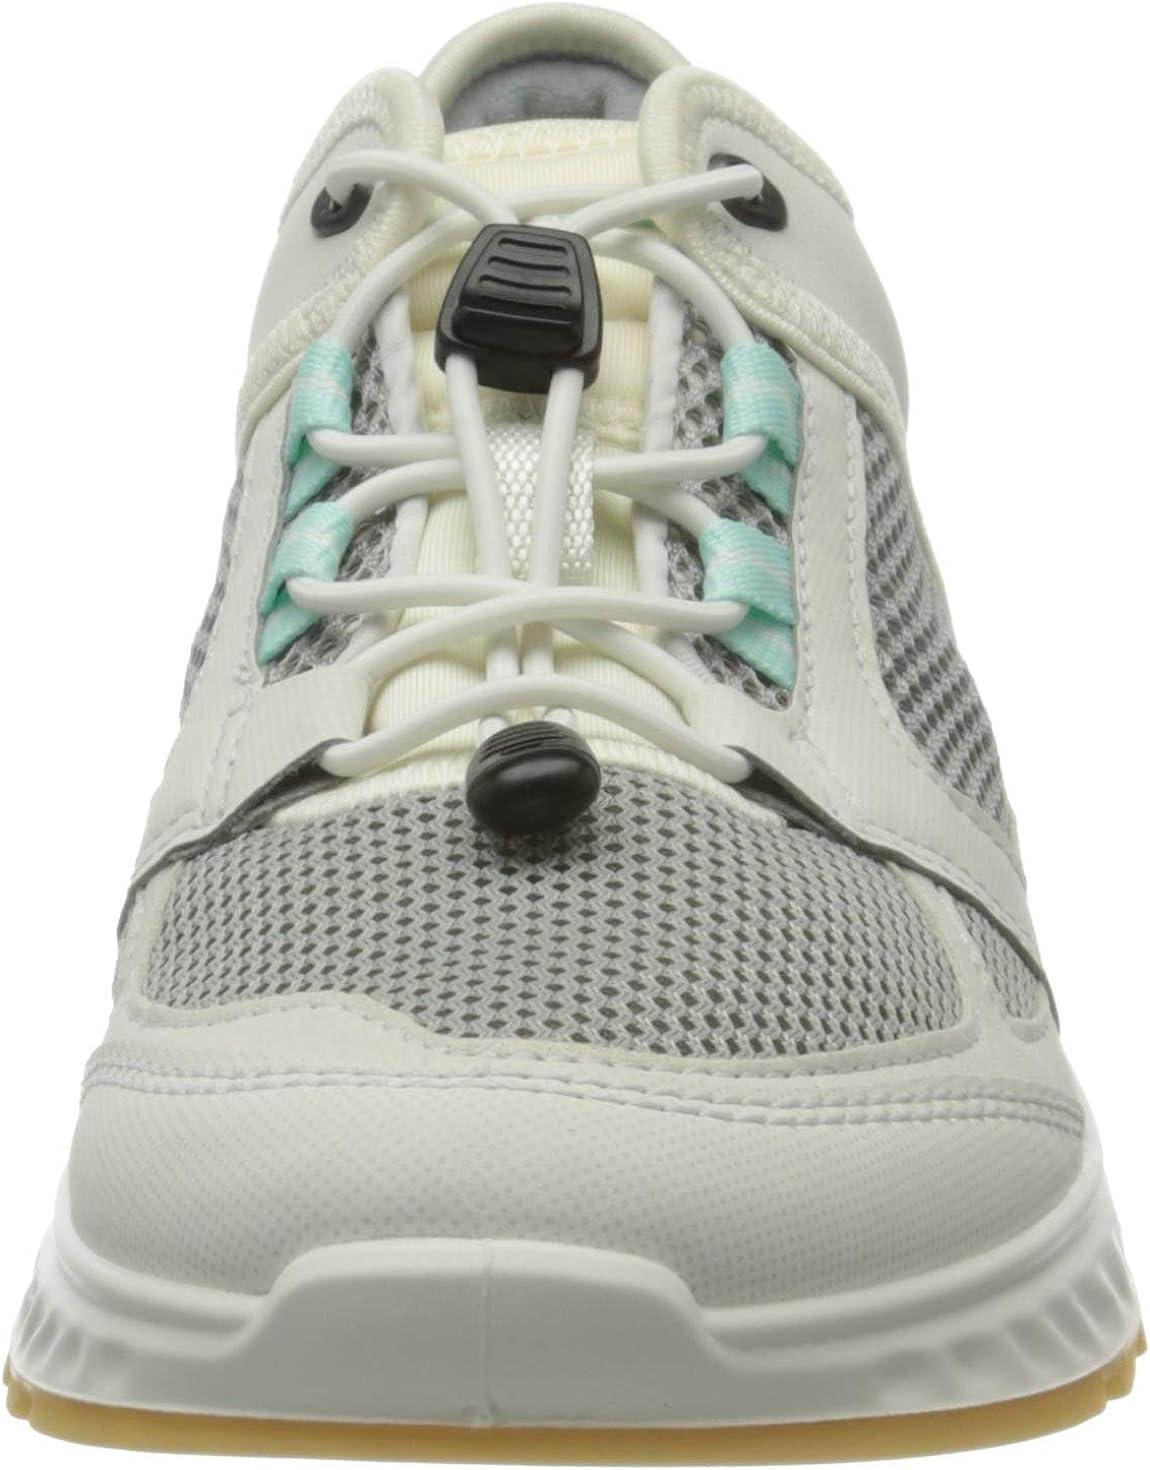 ECCO Exostridew, Sneaker Donna Bianco Shadow White Eggshell Blue 51777